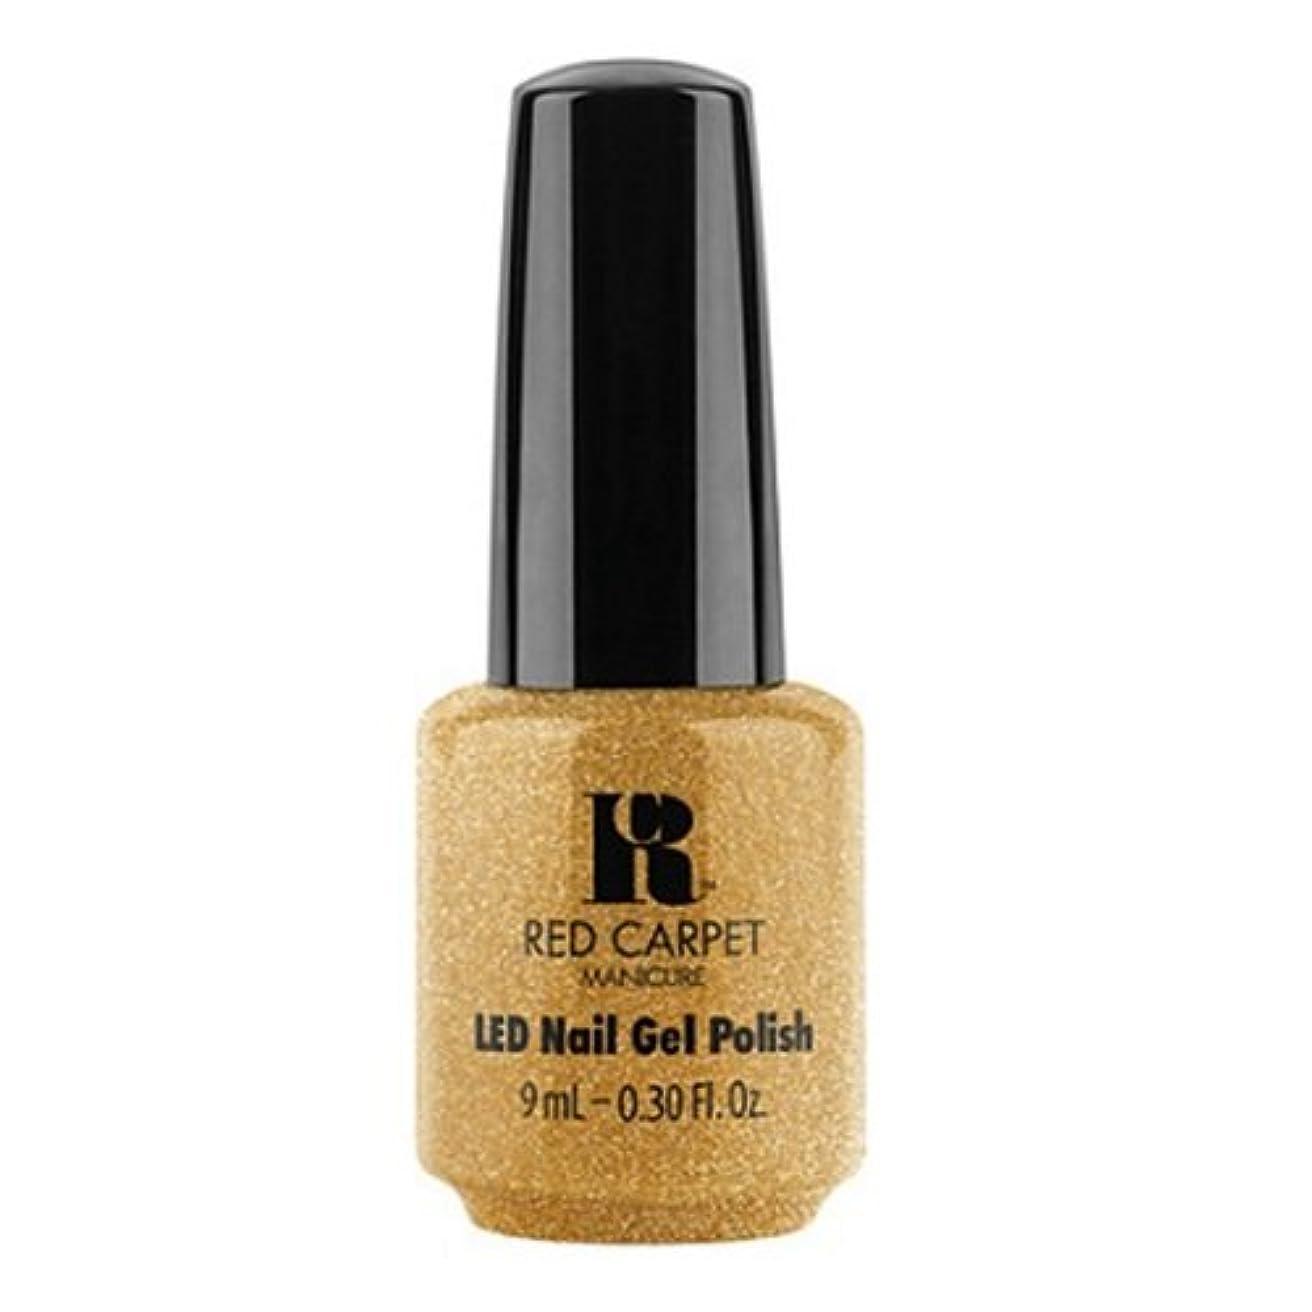 Red Carpet Manicure - LED Nail Gel Polish - Glam & Gorge - 0.3oz / 9ml